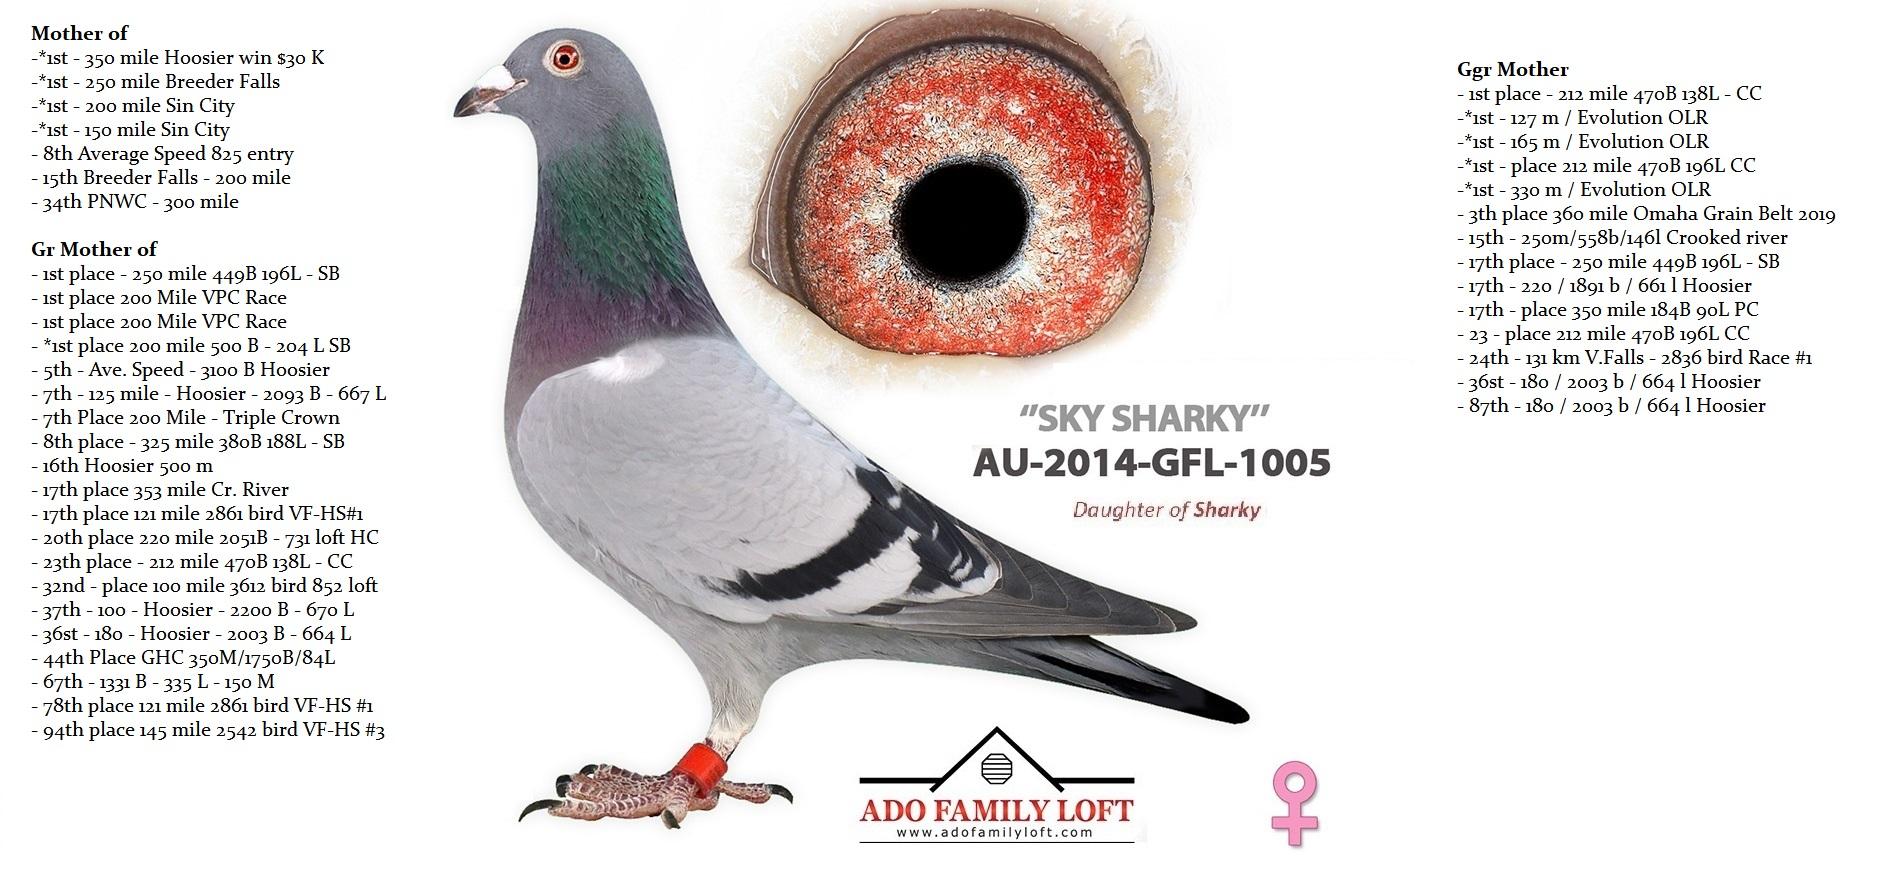 GFL 1005 - 2014